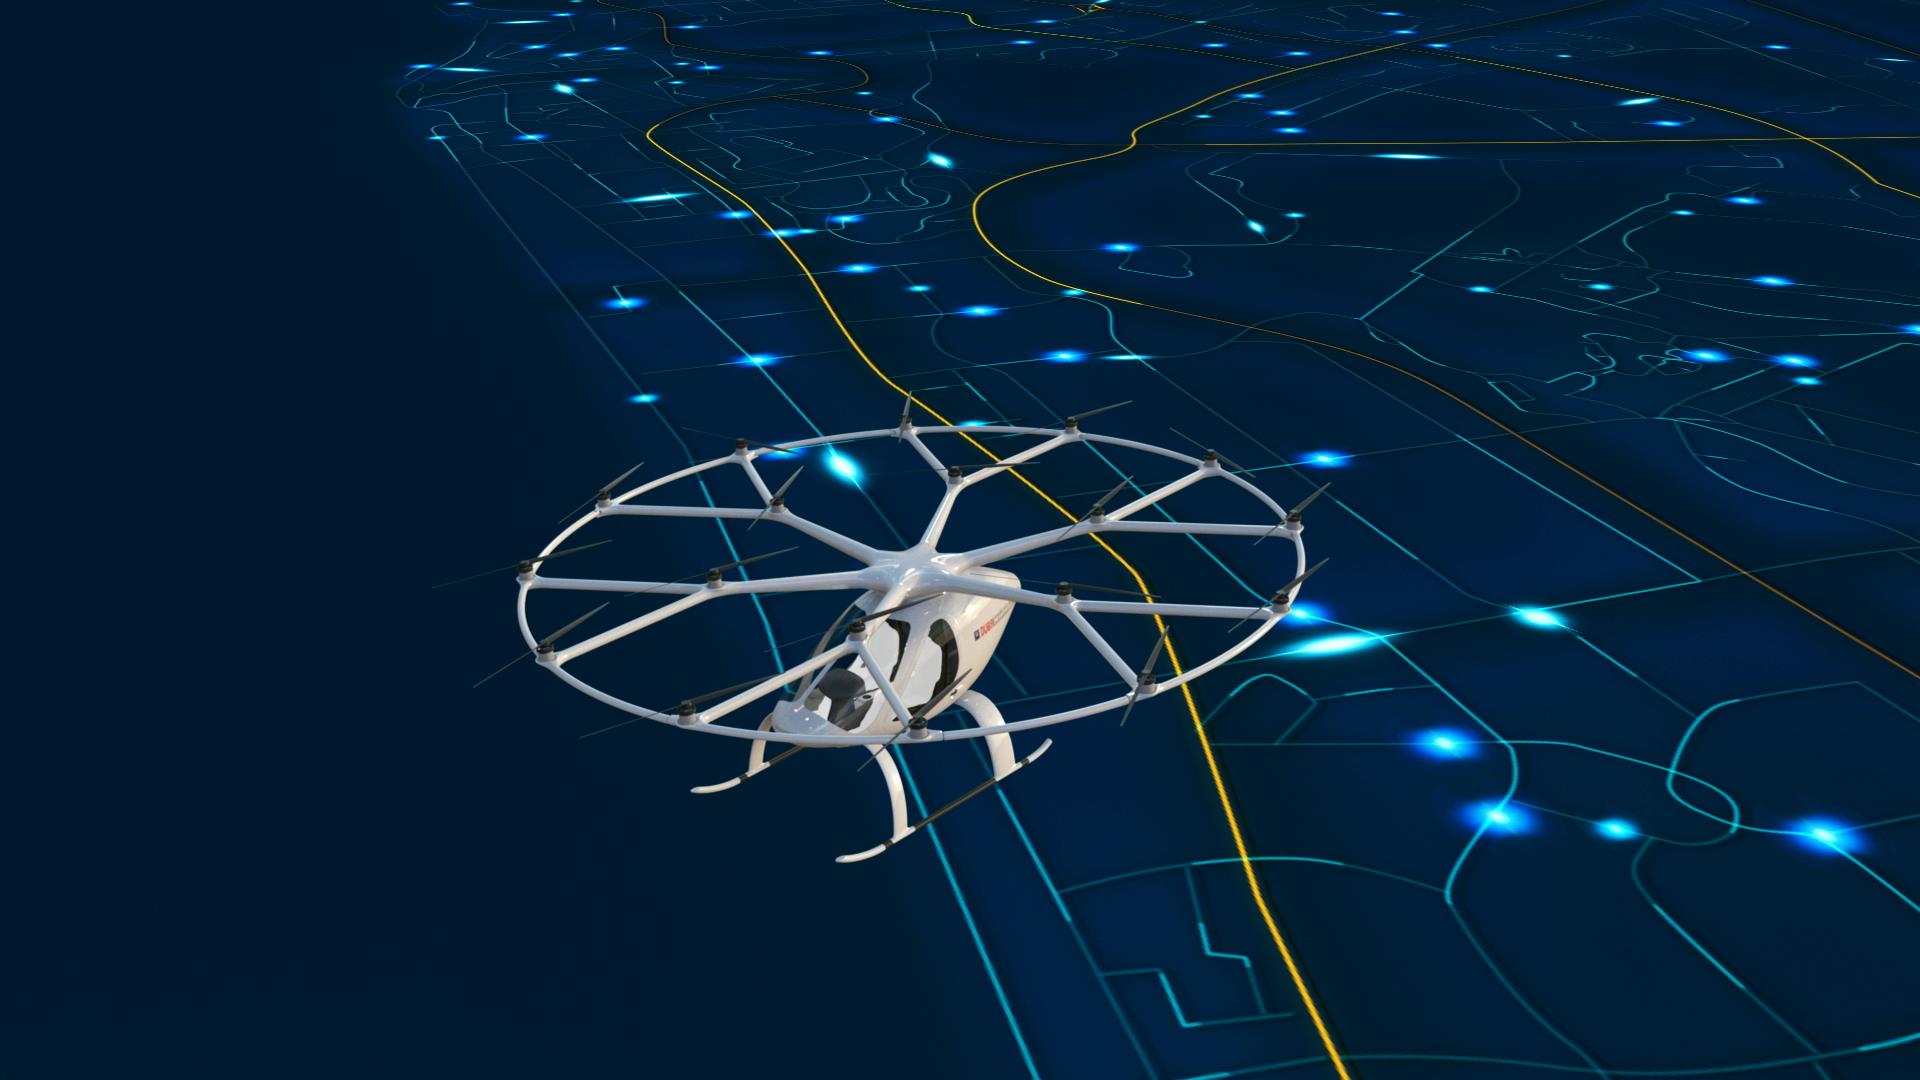 Volocopter 2X Air Taxi autonomous helicopter Dubai